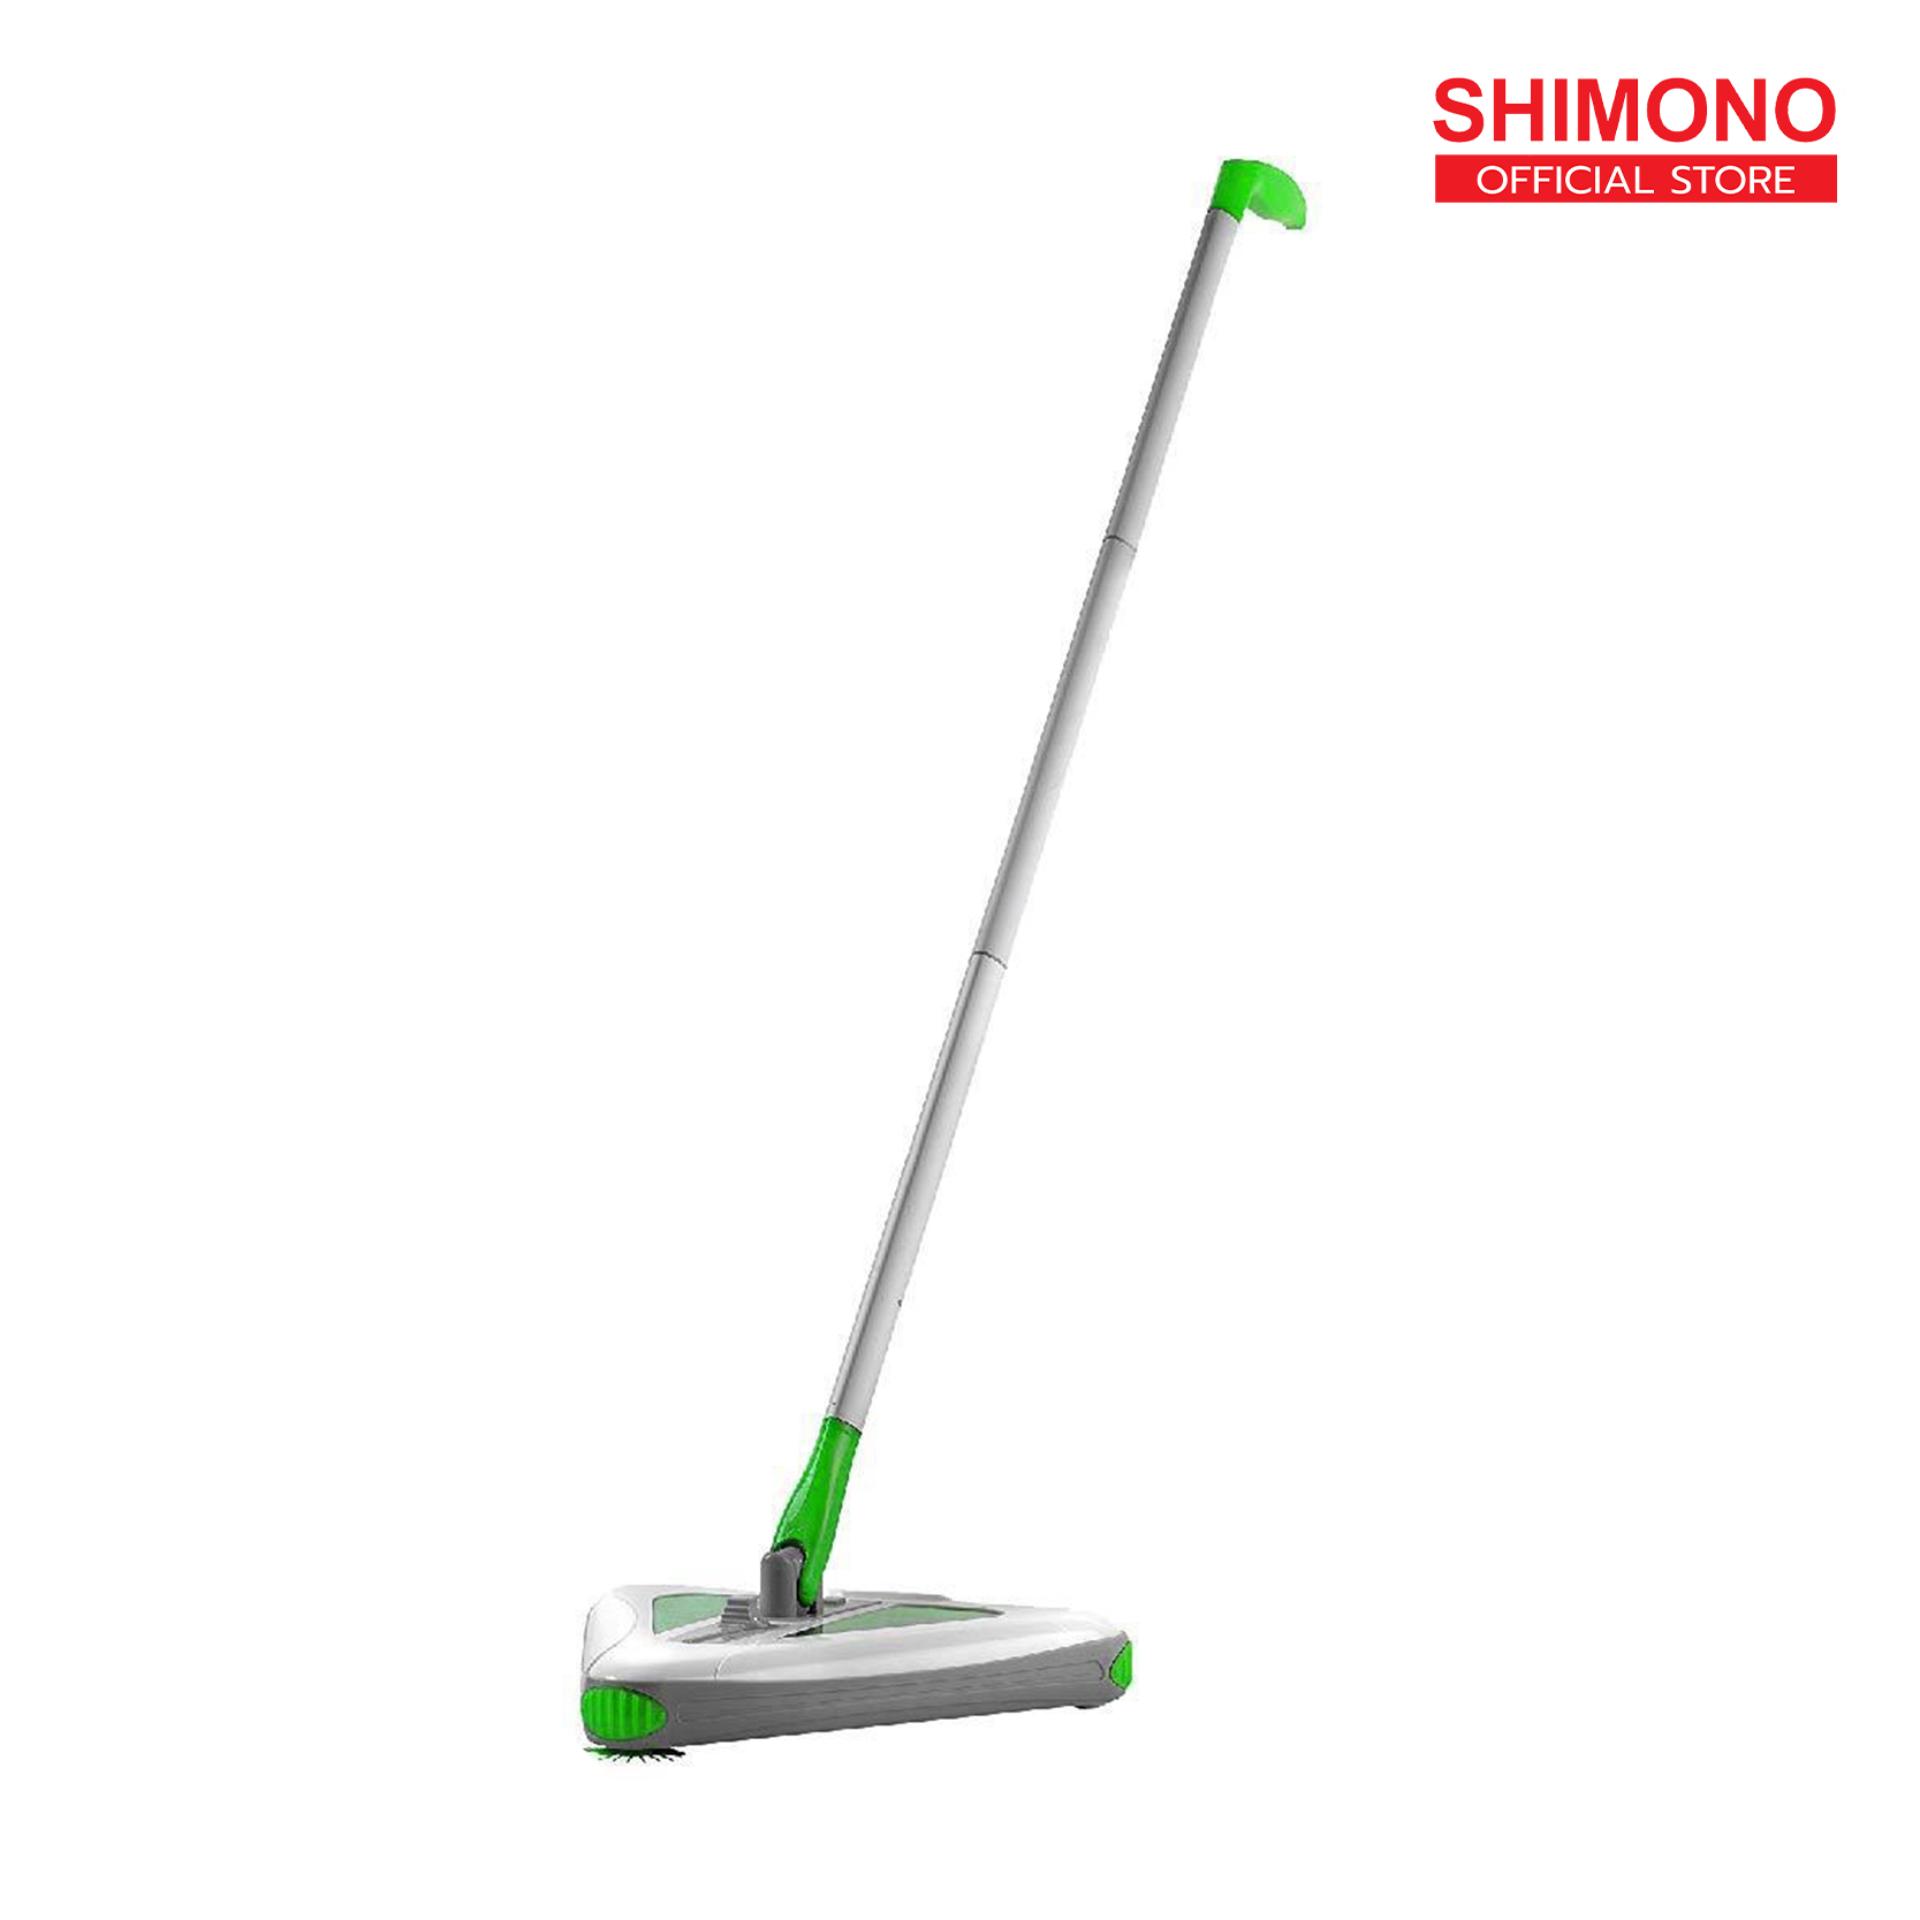 Shimono ไม้กวาดไฟฟ้าอัจฉริยะ Sw-3737 ไม้กวาดสามเหลี่ยม.